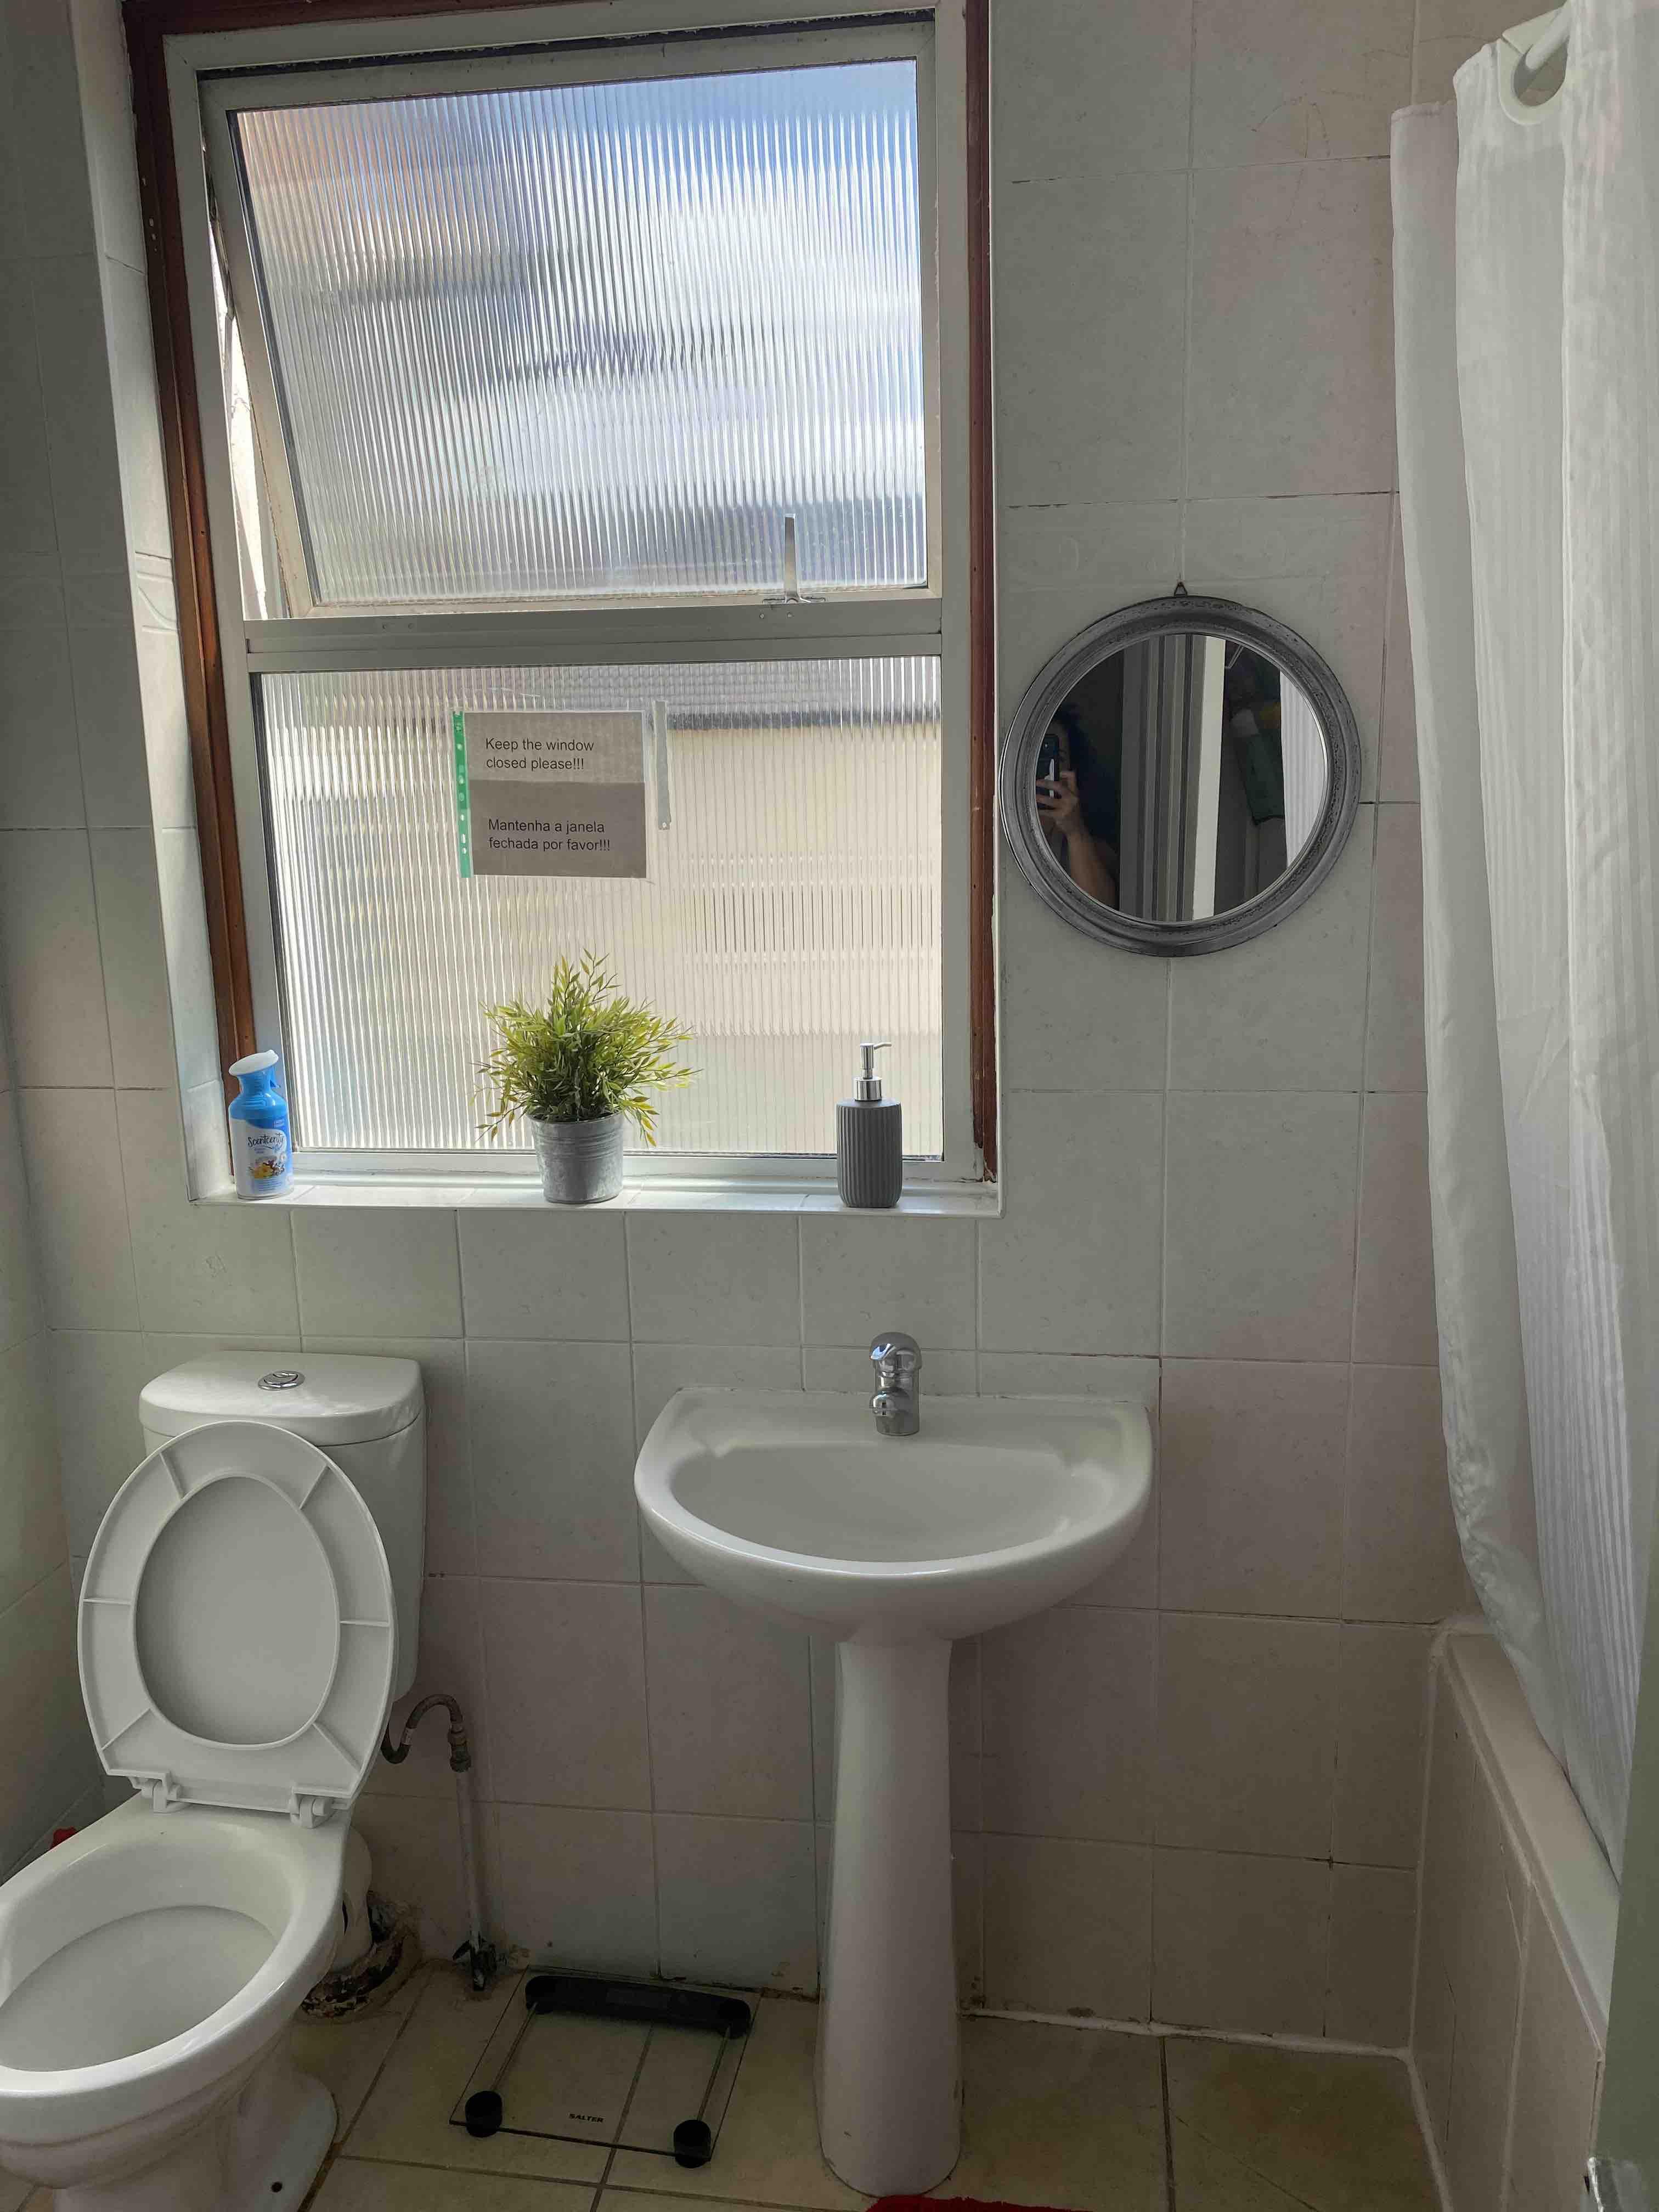 1 room in Bruce Grove, London, N17 6UJ RoomsLocal image